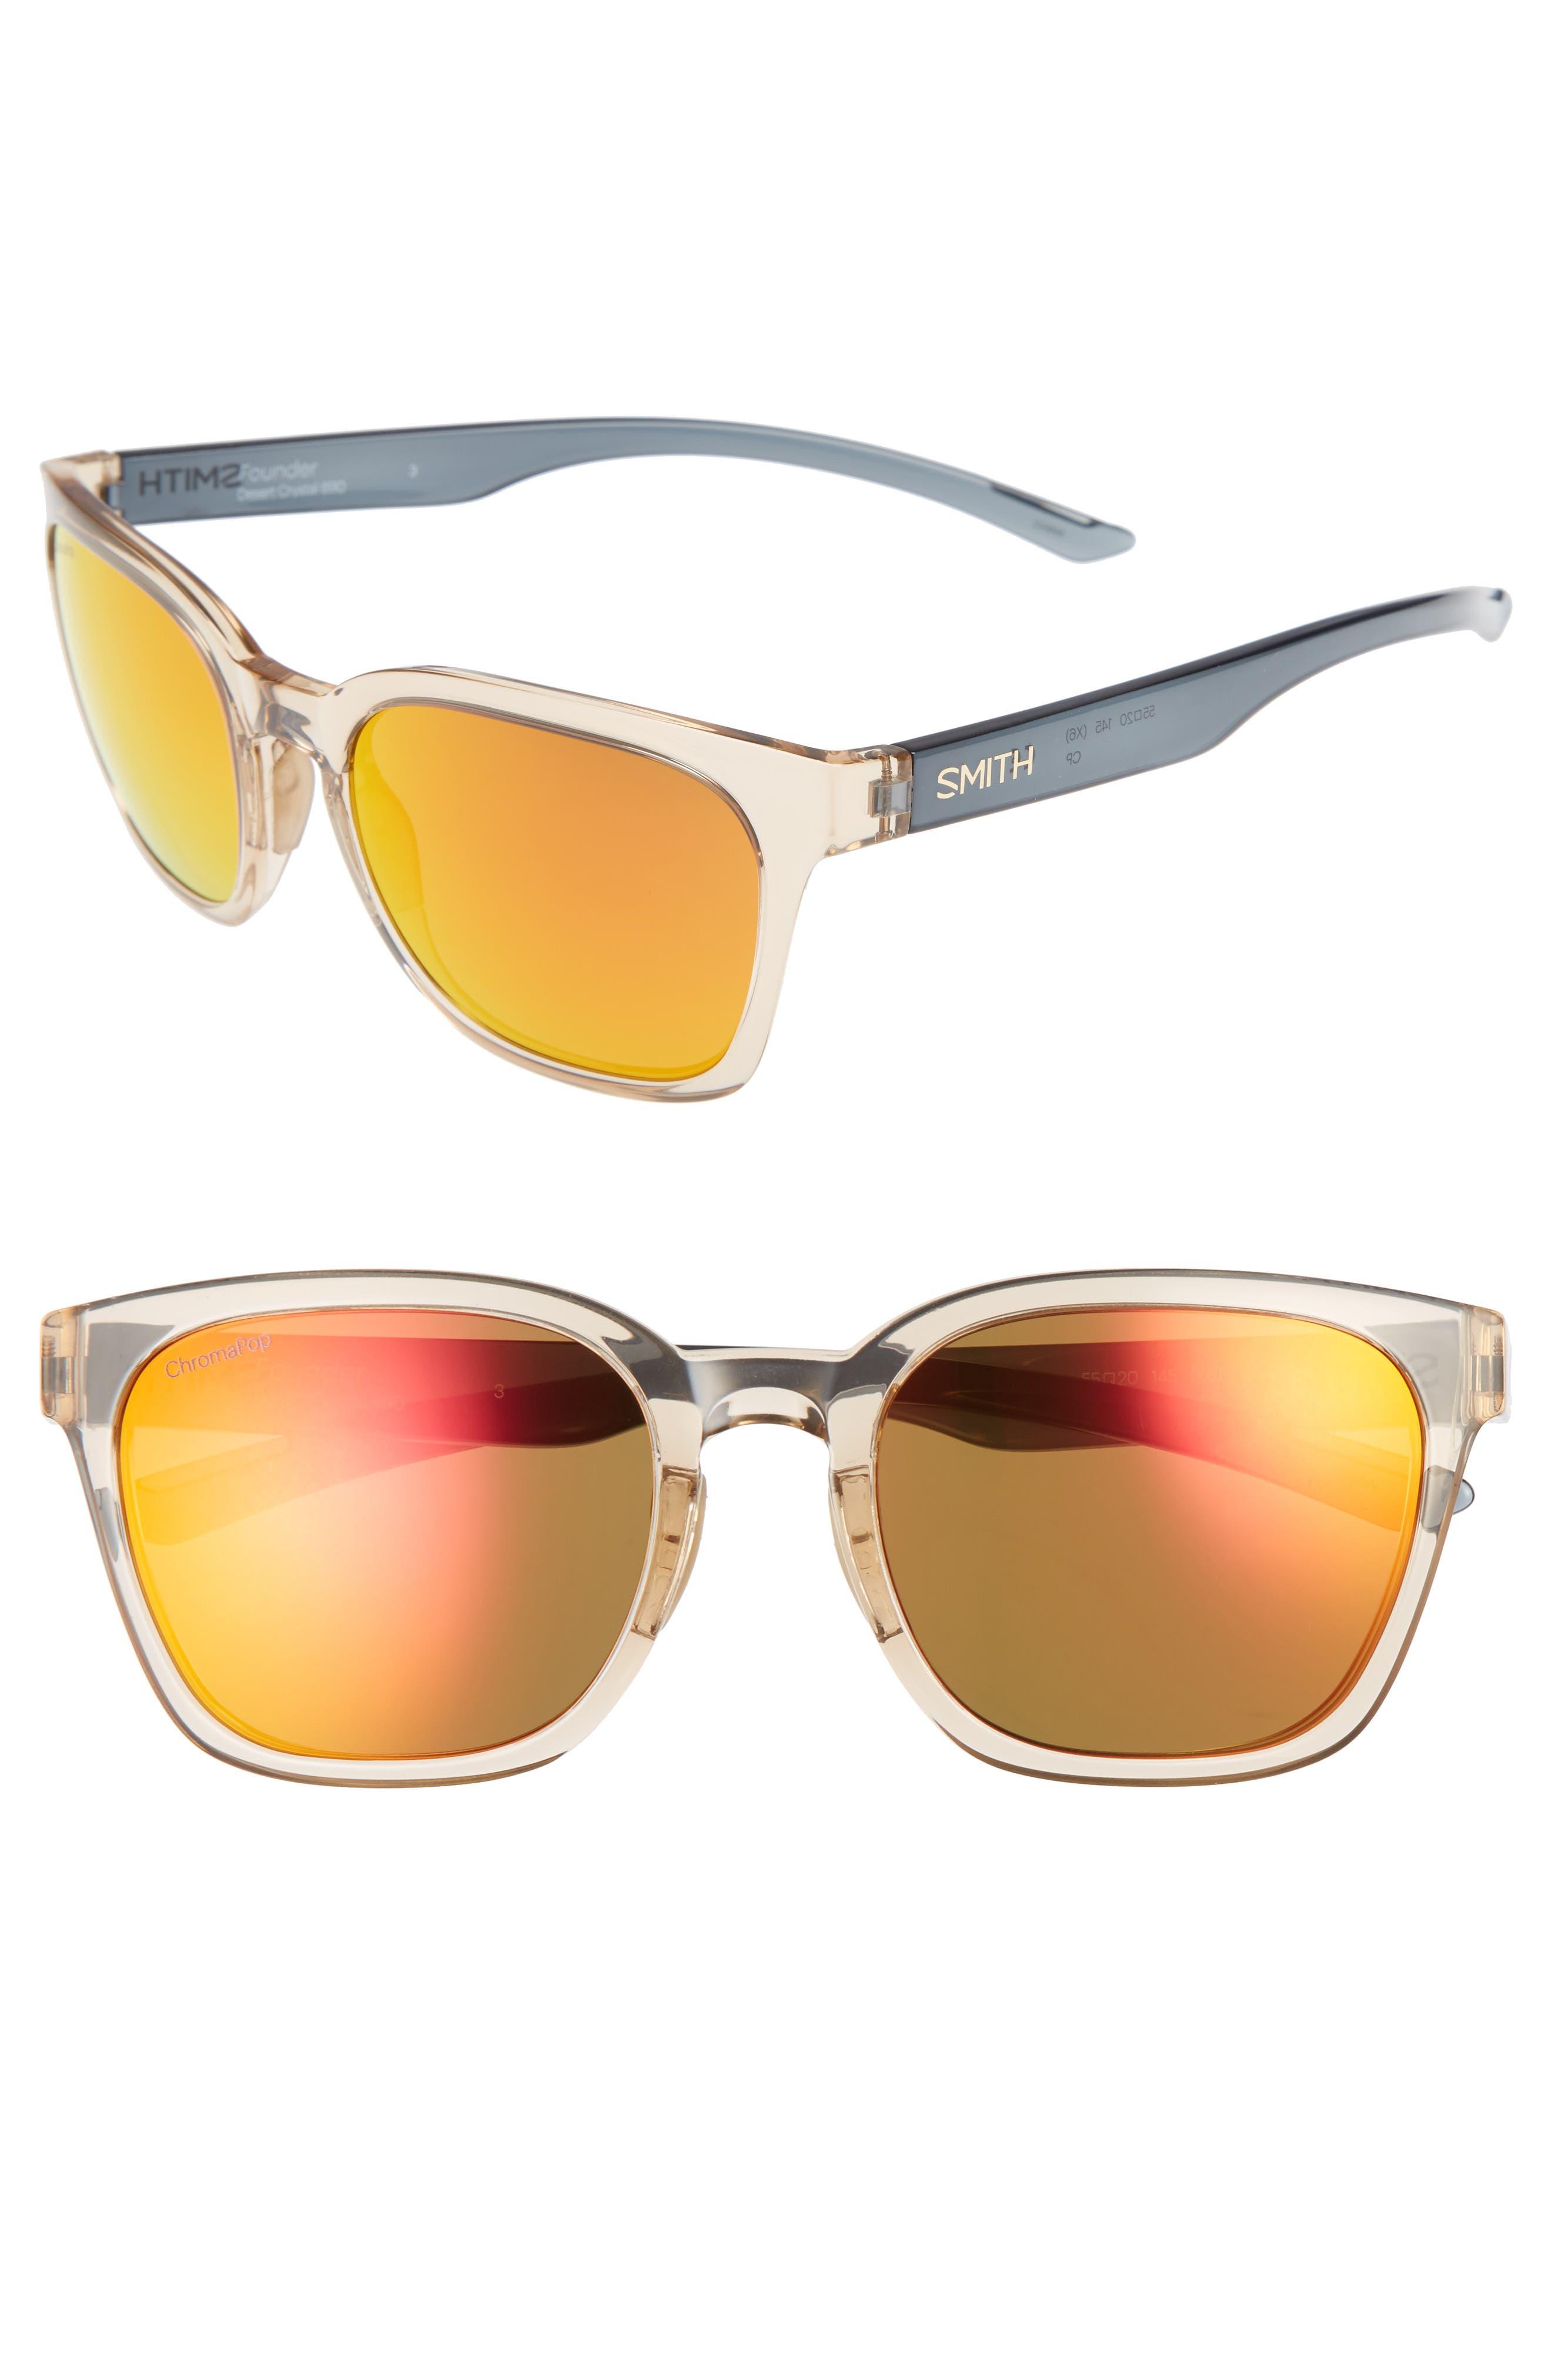 SMITH Founder 55mm ChromaPop Polarized Sunglasses